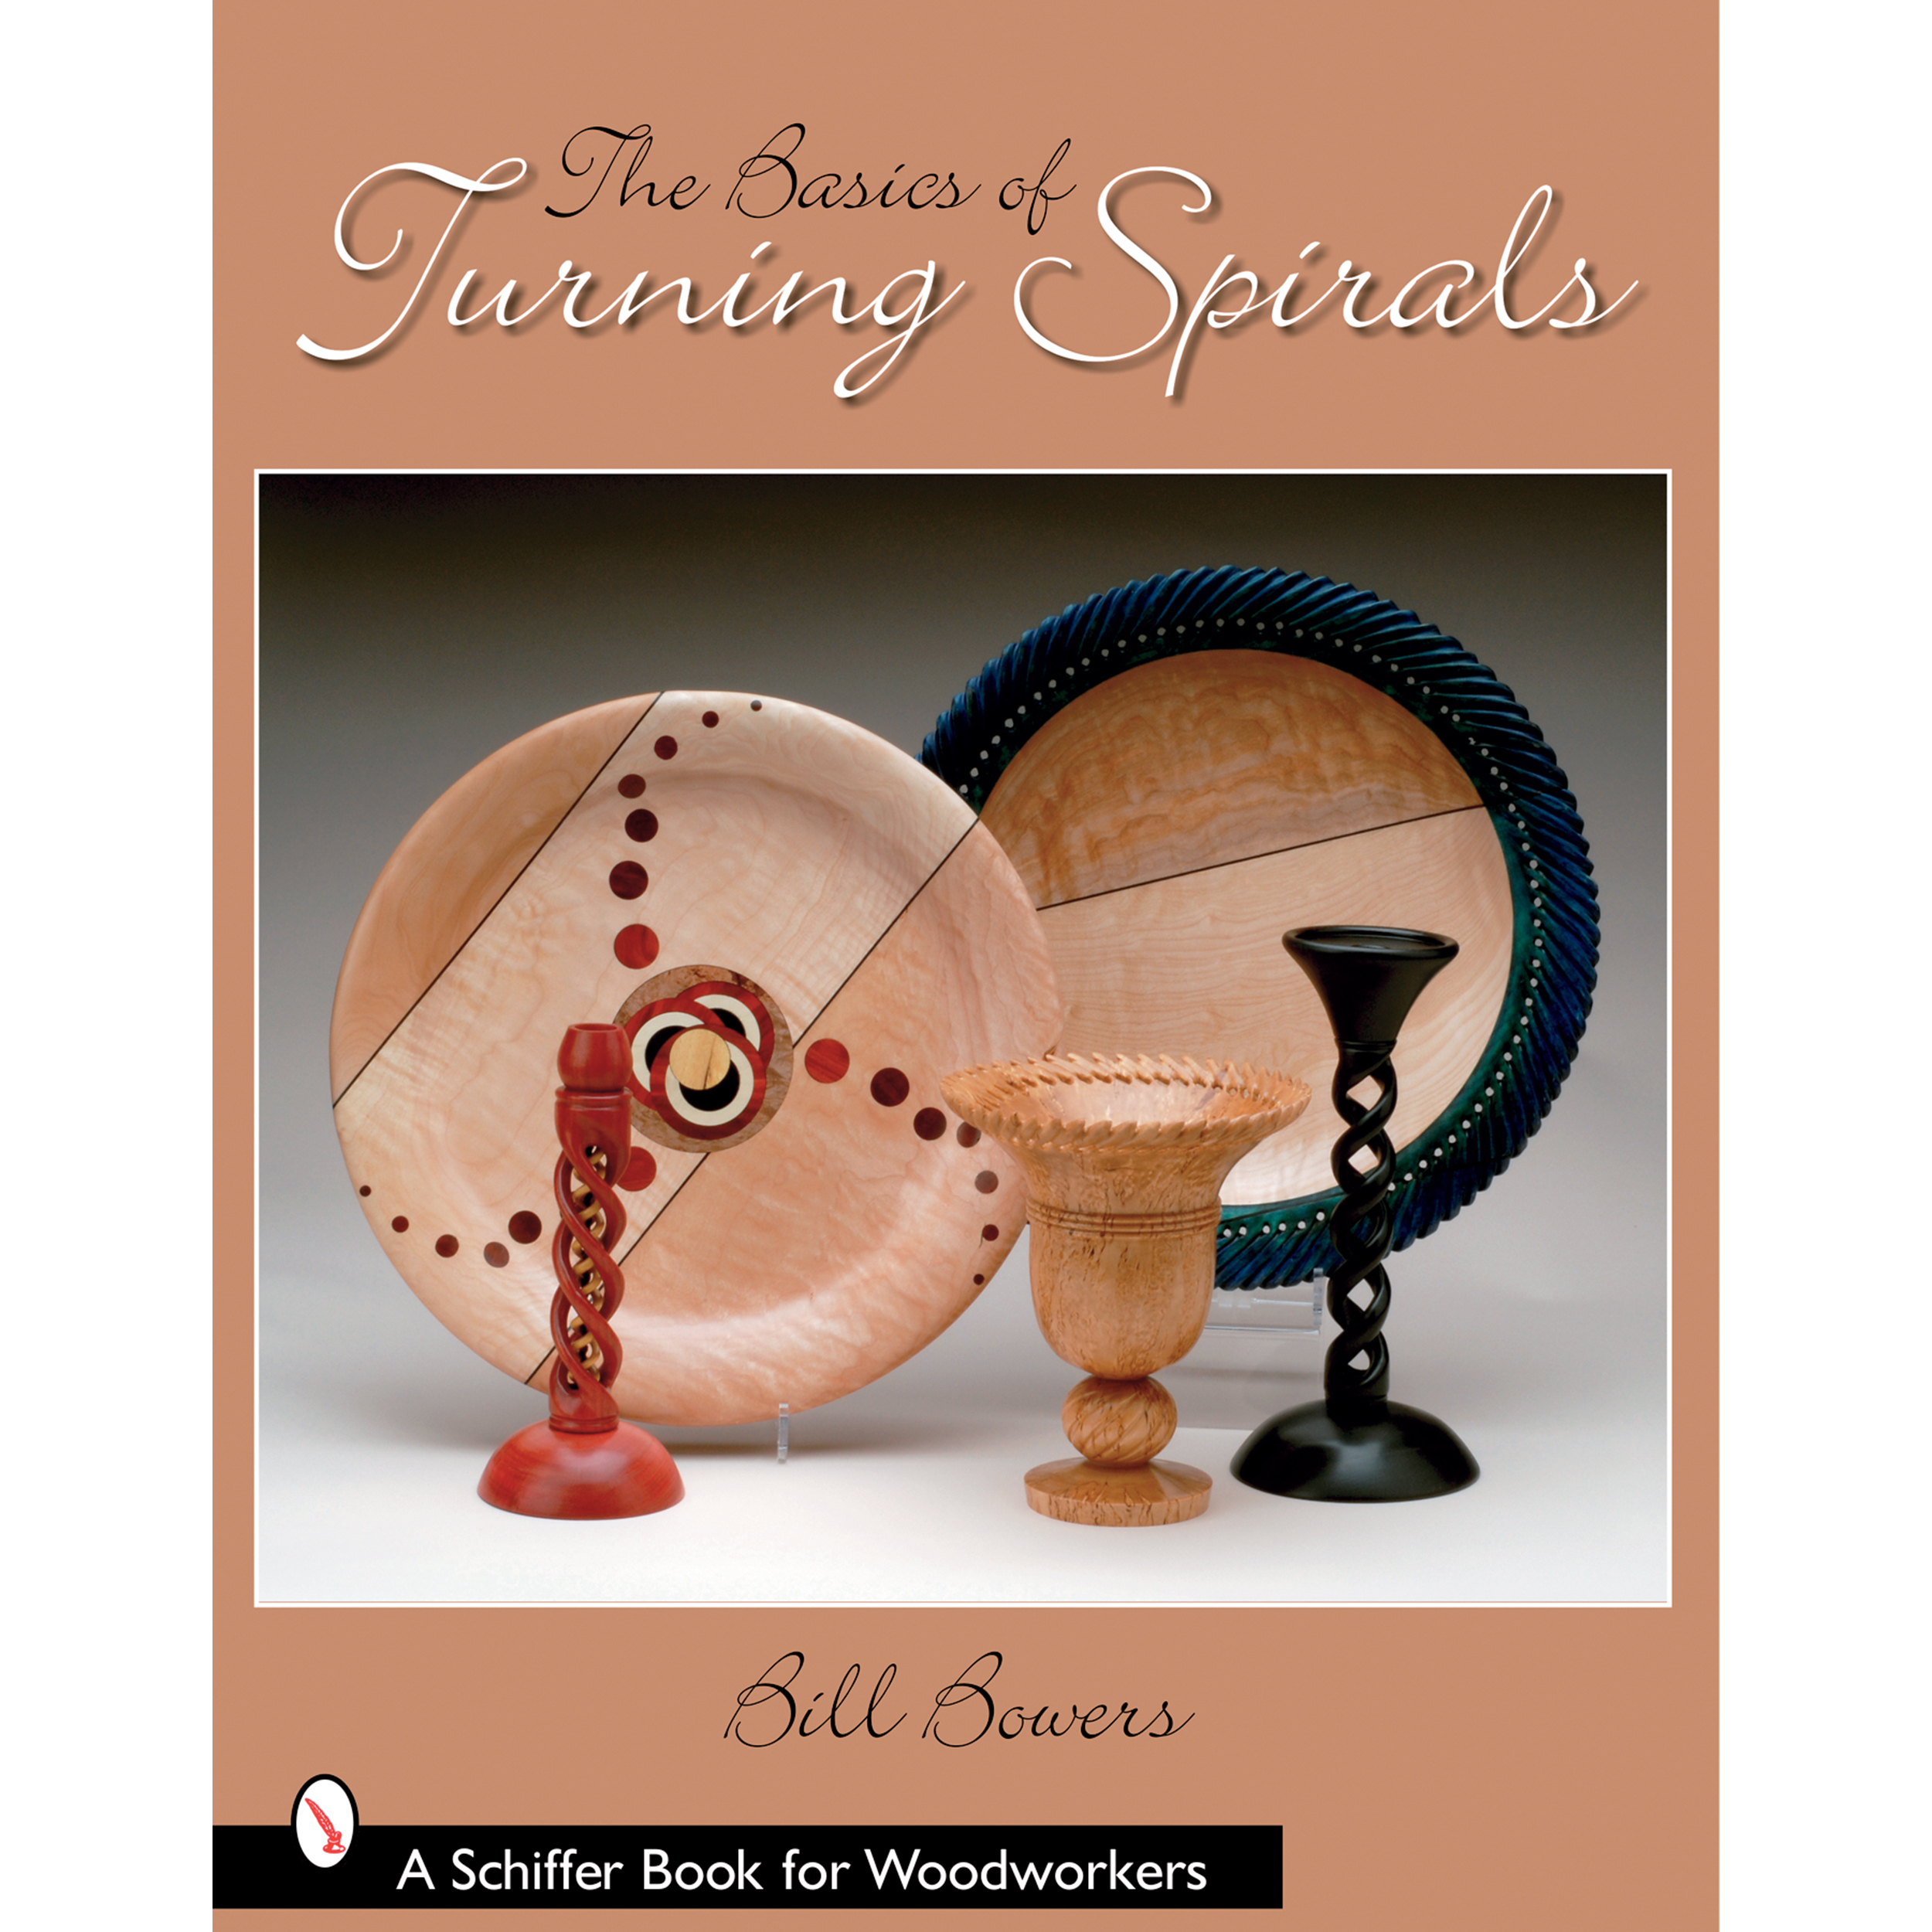 The Basics of Turning Spirals